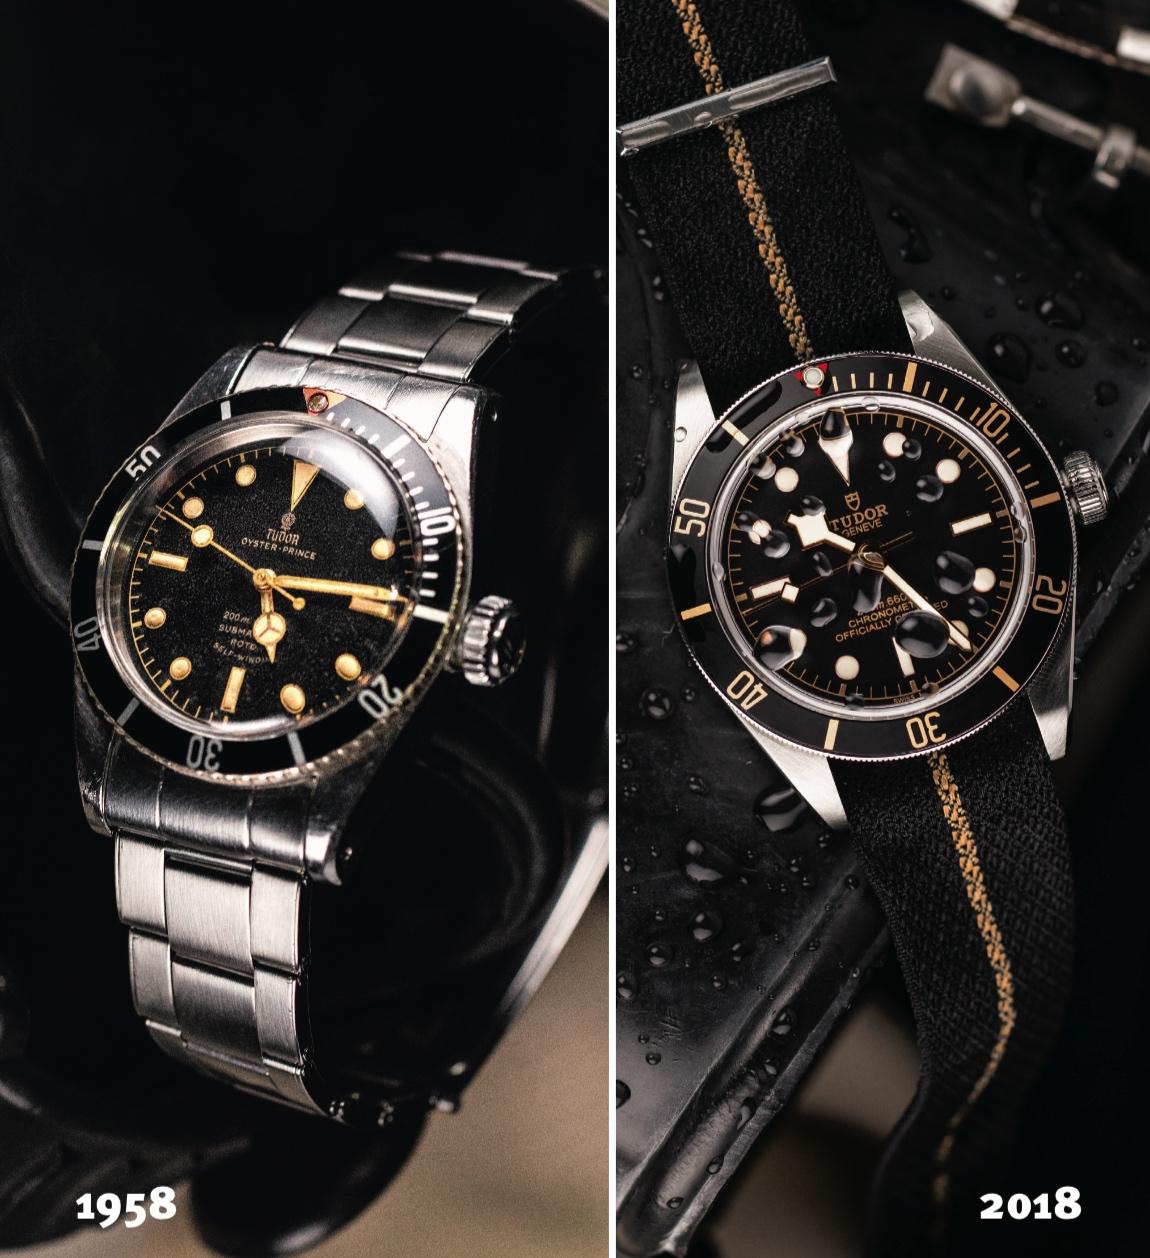 1958 Tudor Submariner-Ref. 7924 next to 2018 Tudor Black Bay 58 Ref. 79030N